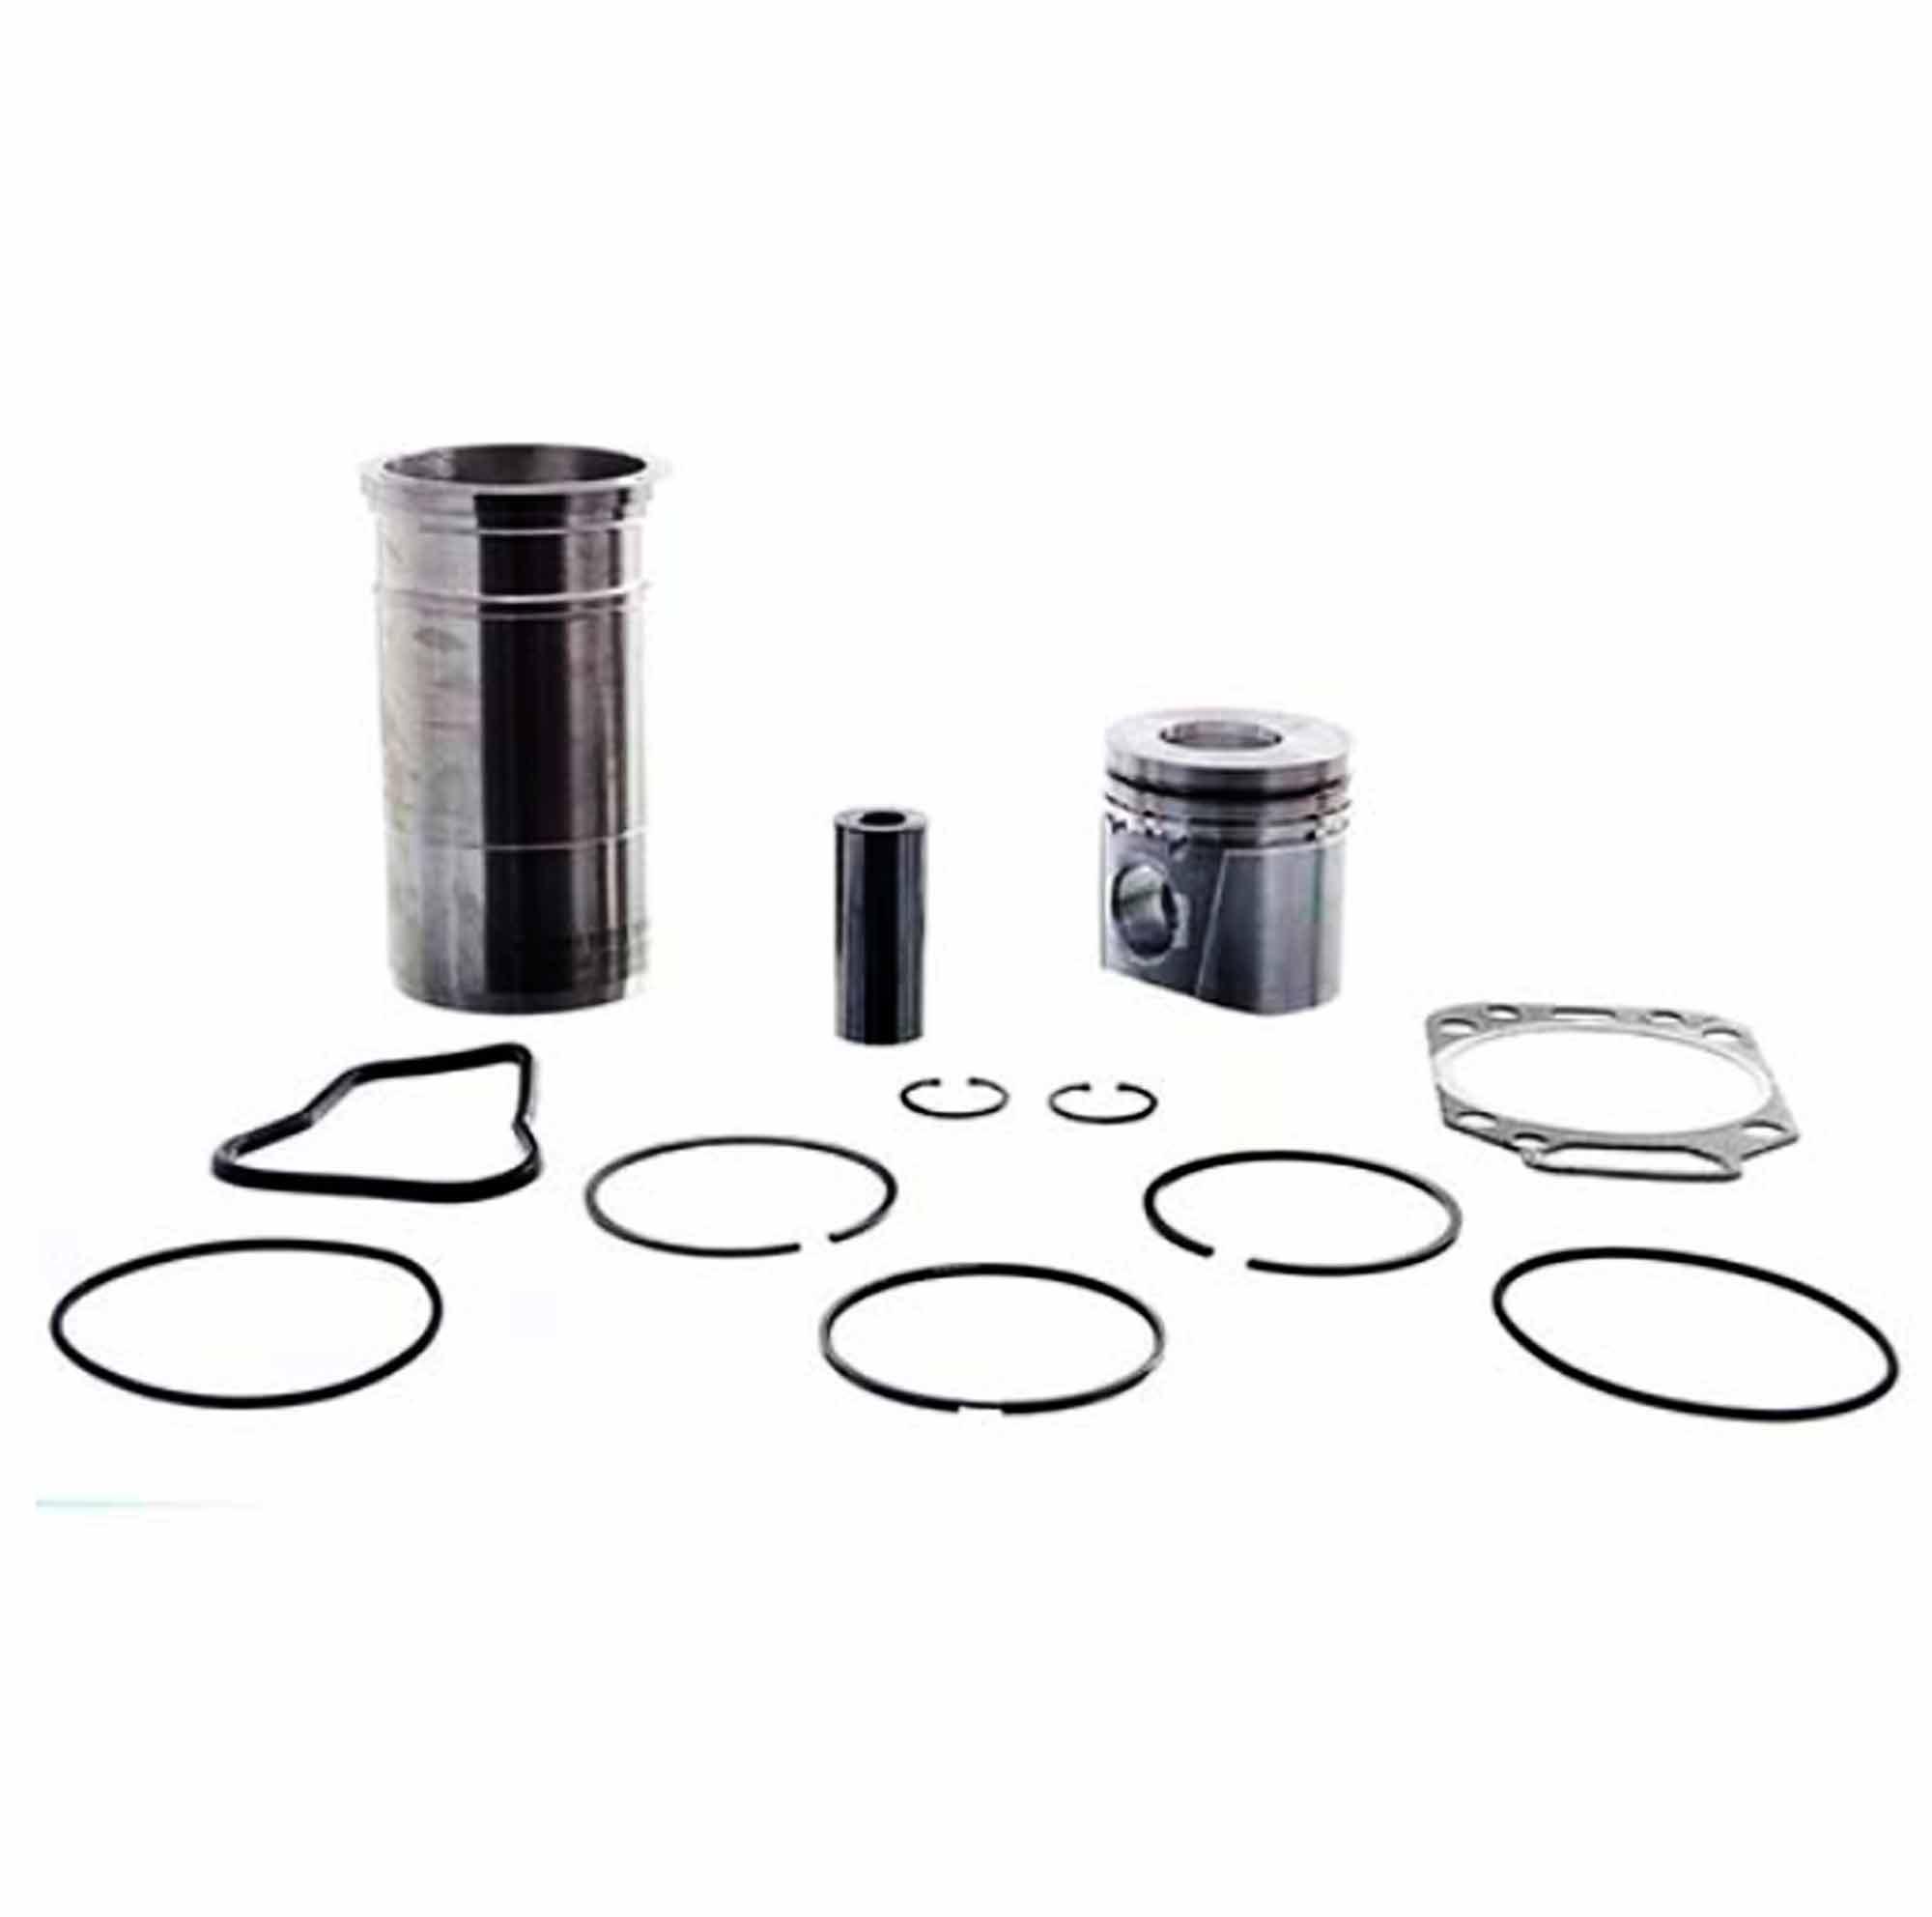 941080191158 - Kit de reparo para 1 cilindro MWM